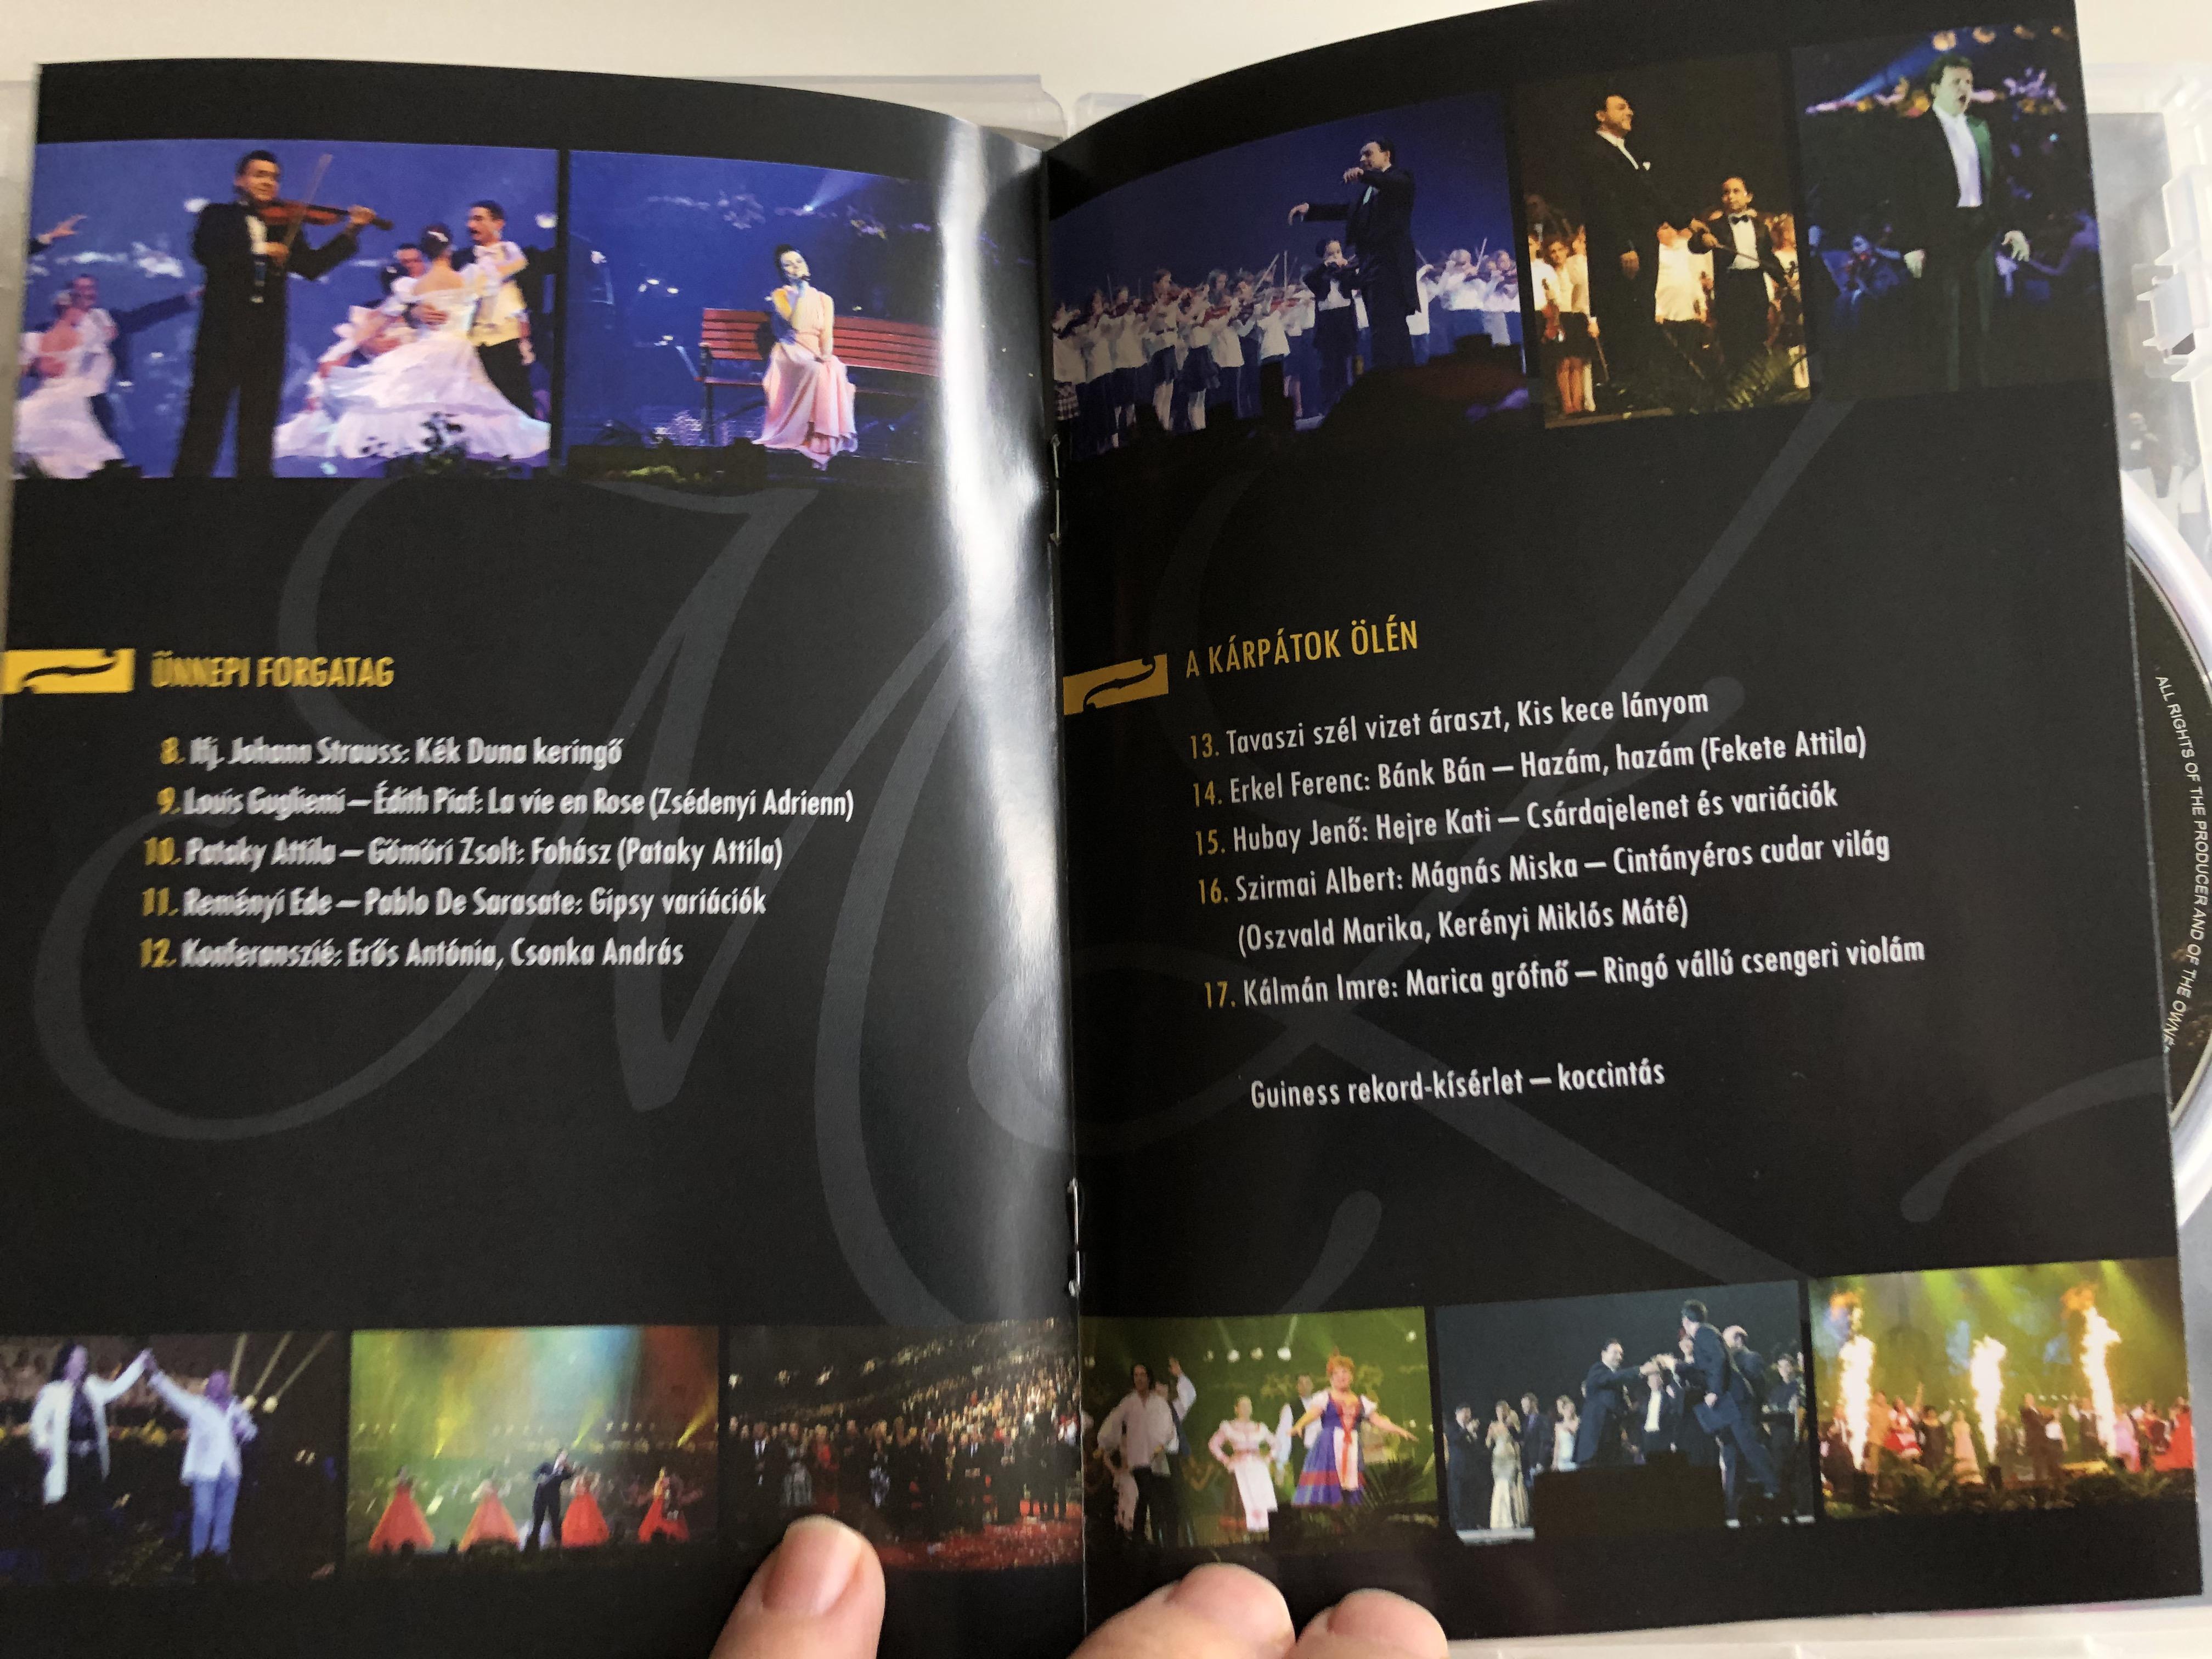 m-ga-zolt-n-2011-budapesti-j-vi-koncert-dvd-2011-tom-tom-records-ttdvd-156-4-.jpg